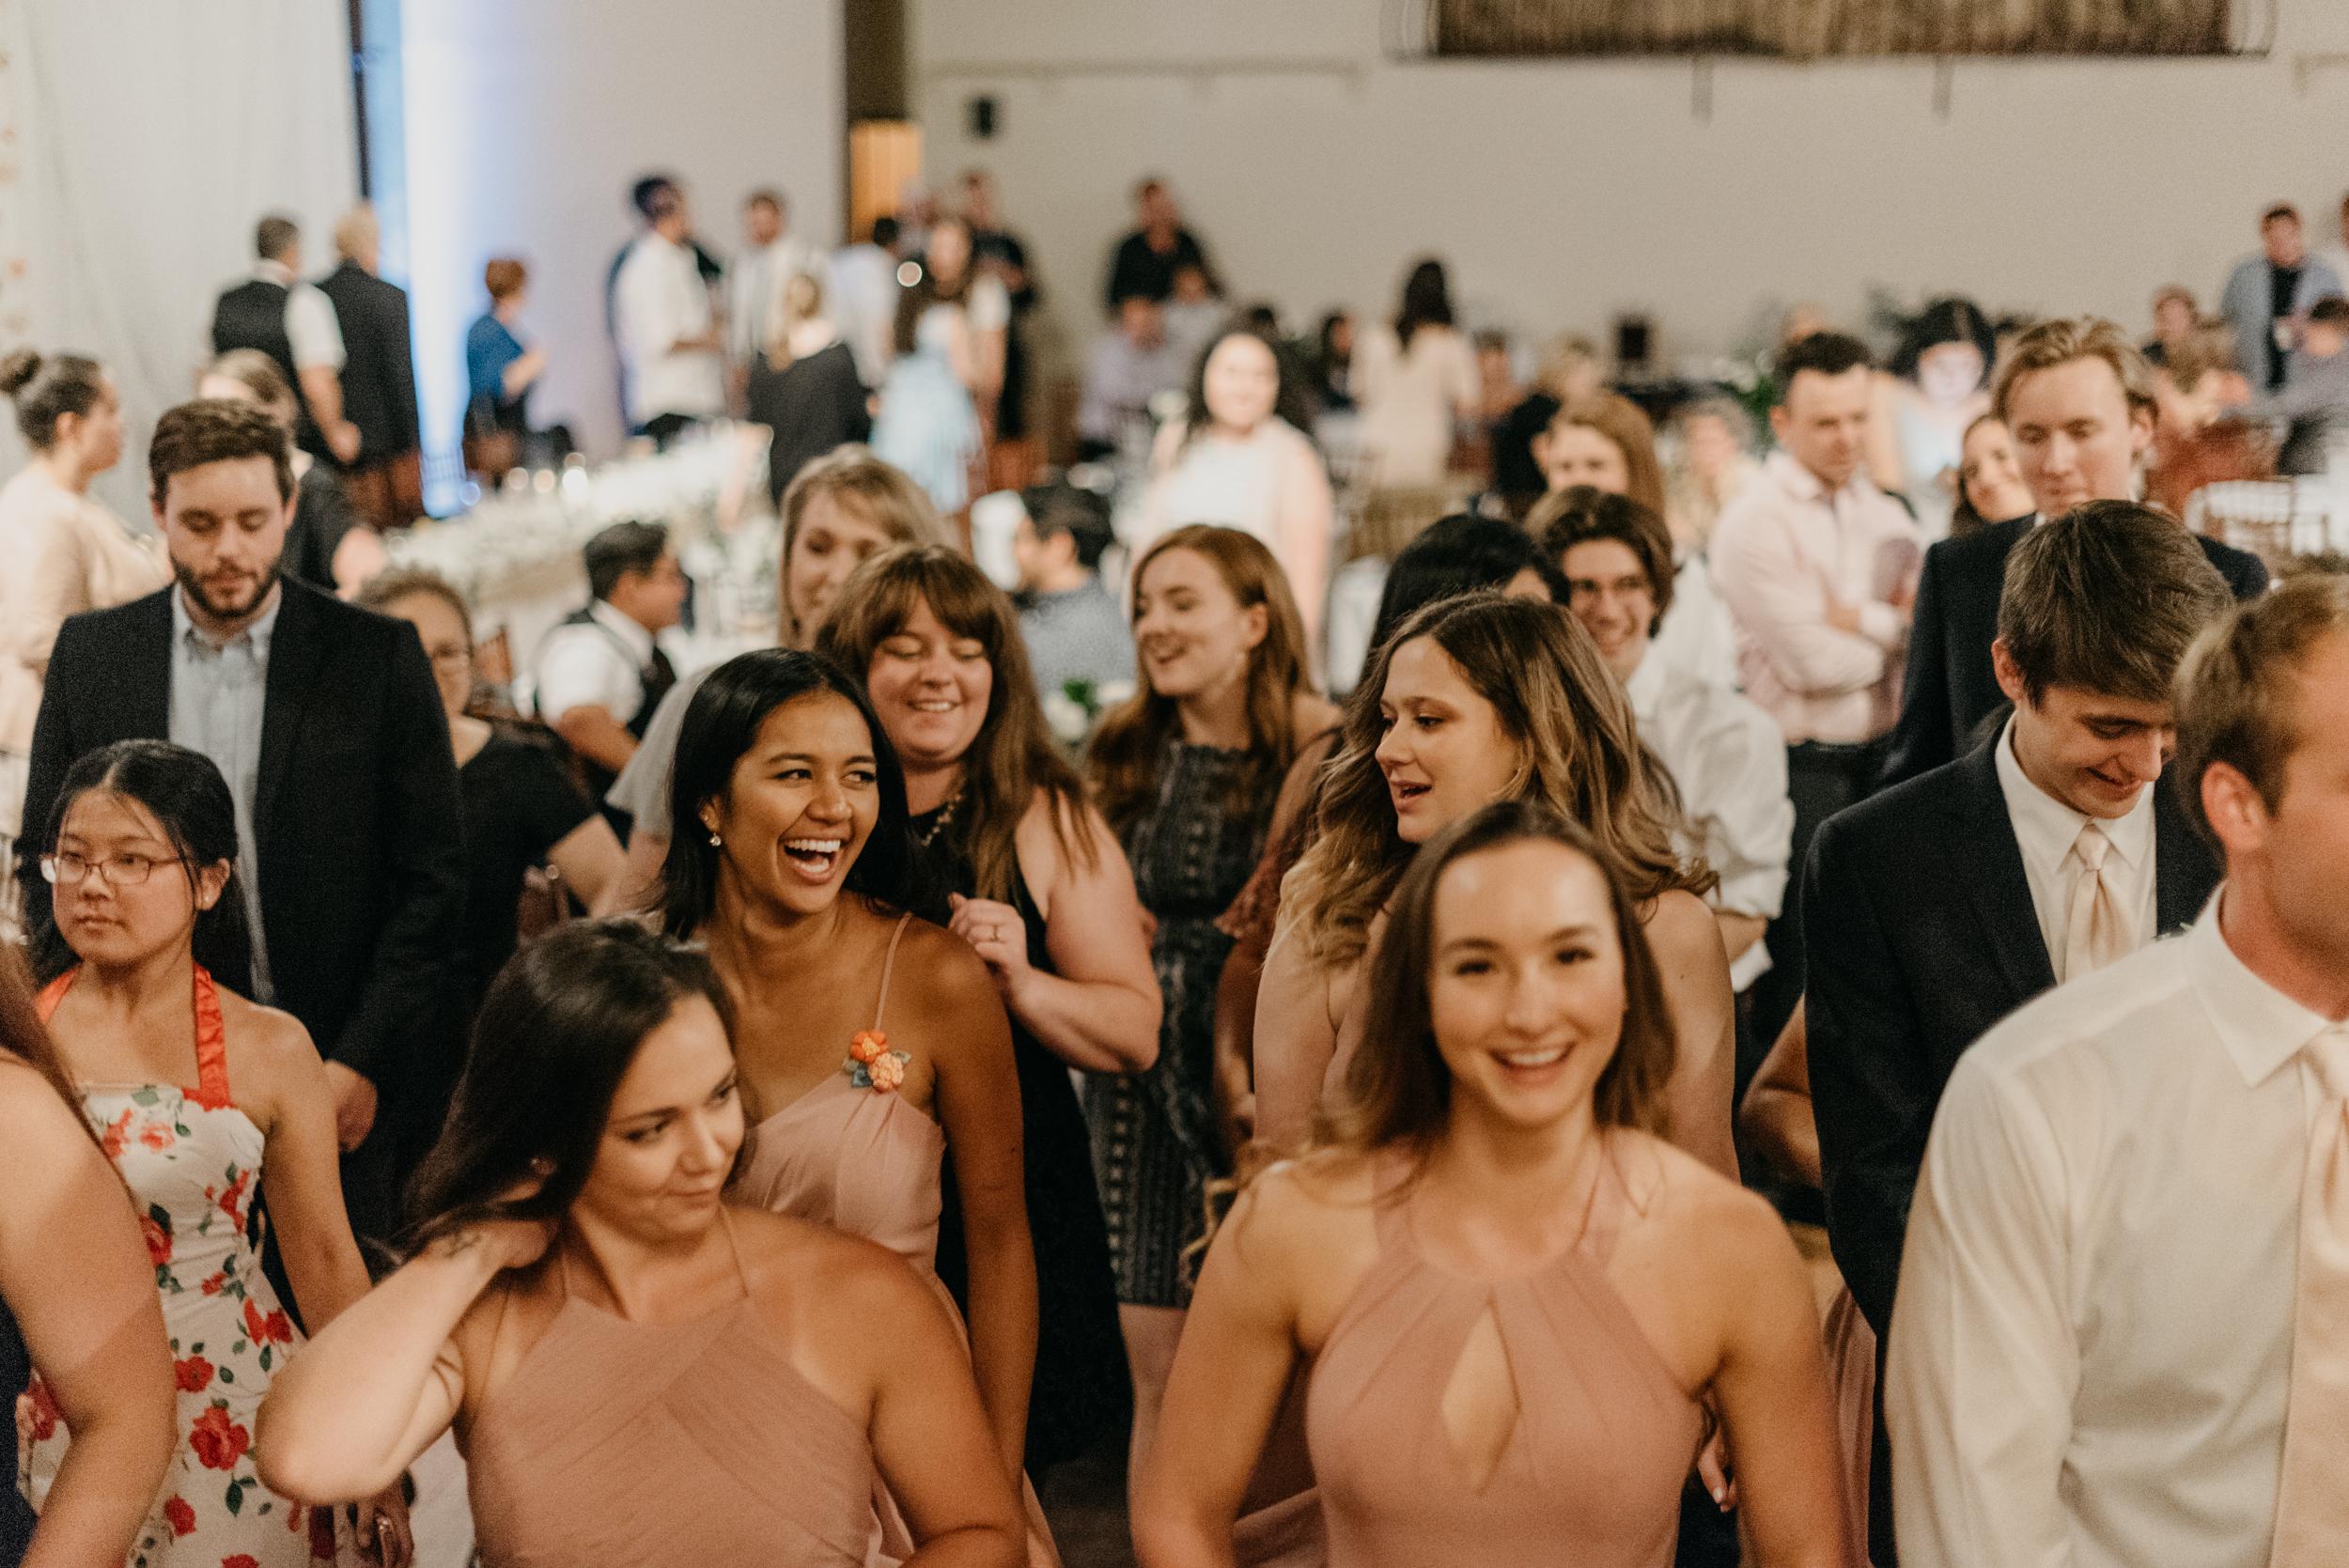 126-reception-west-end-ballroom-portland-wedding-photographer-9956.jpg